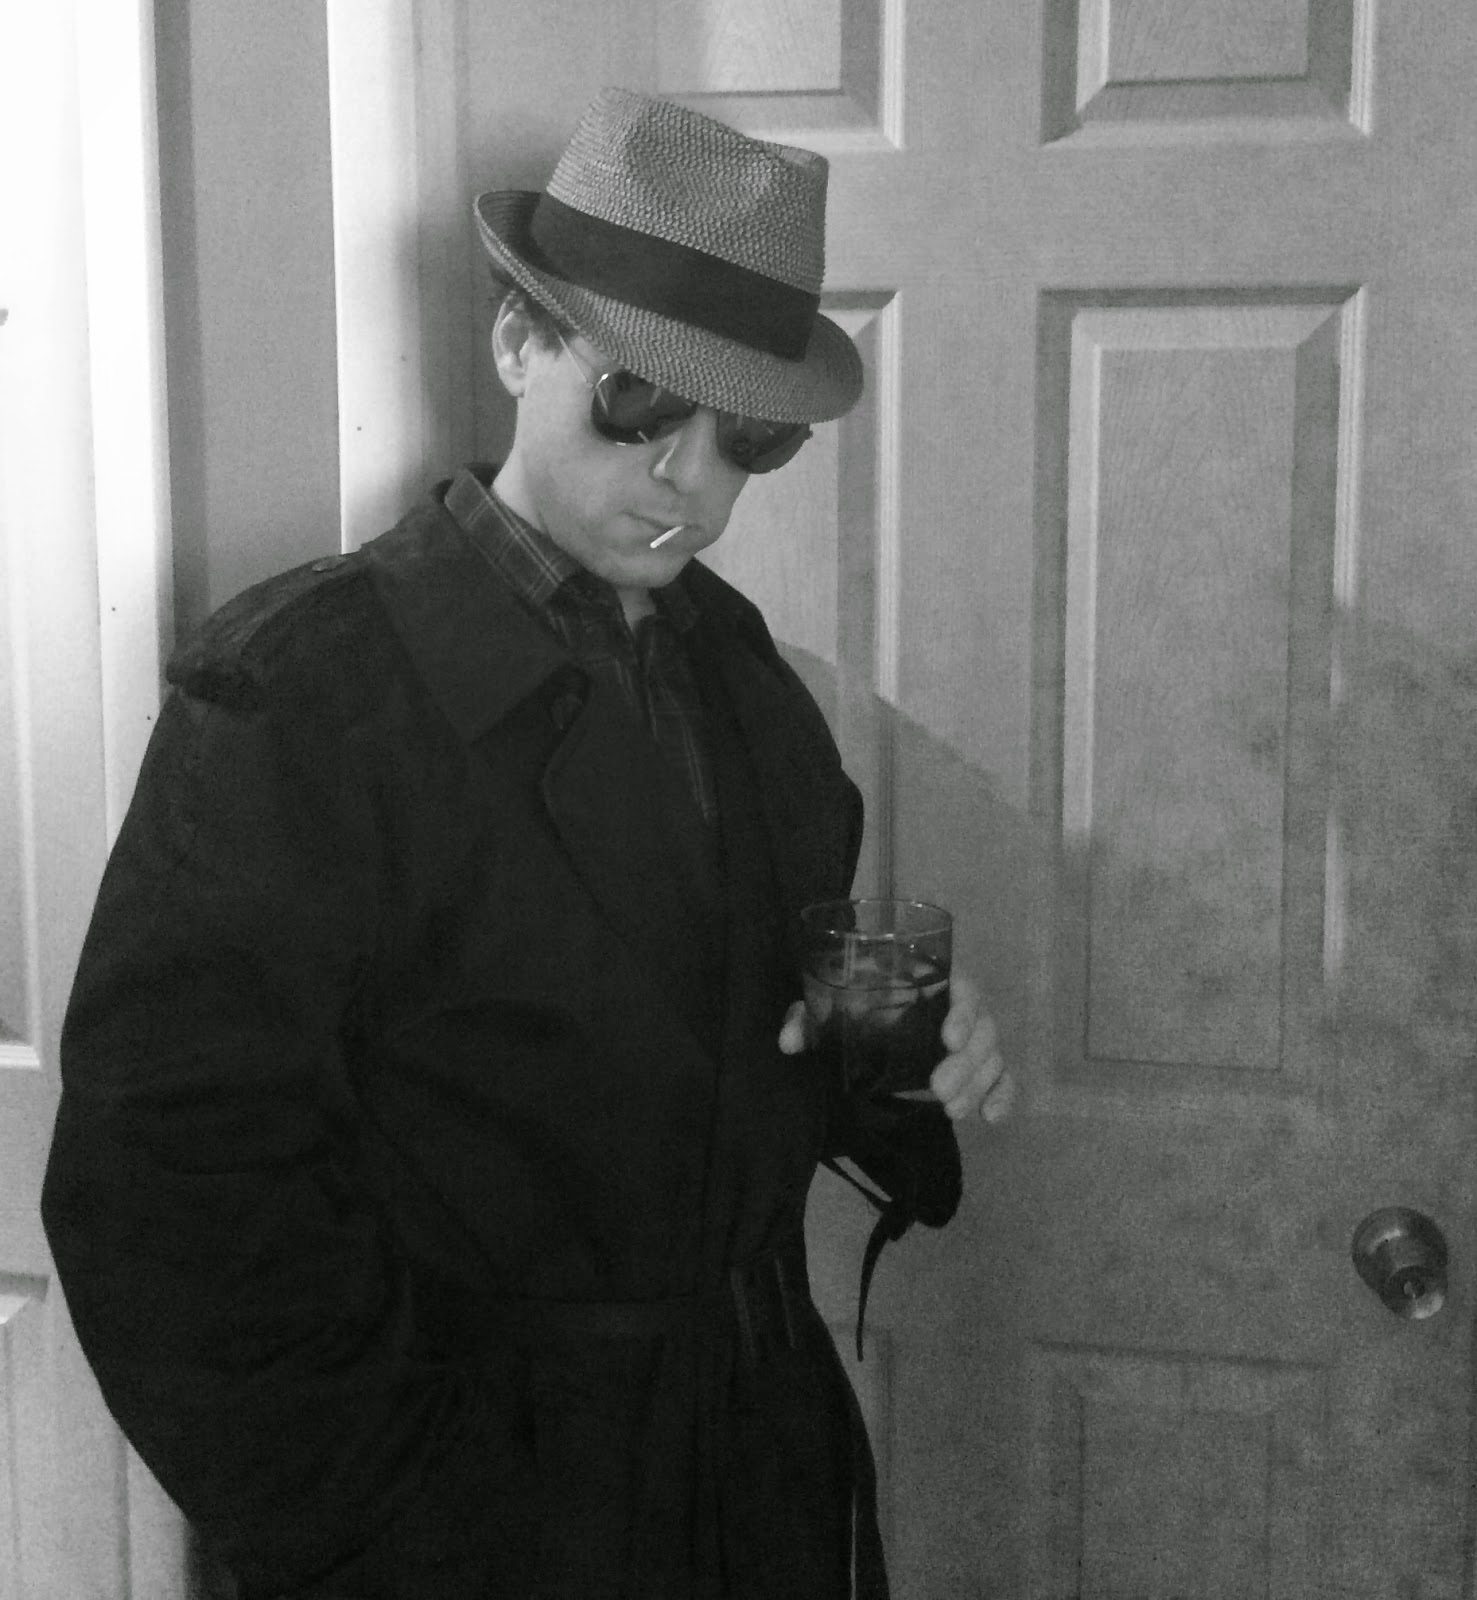 Neo Noir Movies: Living 4 Crits: Shotguns & Sorcery (& My Neo-Noir Fascination